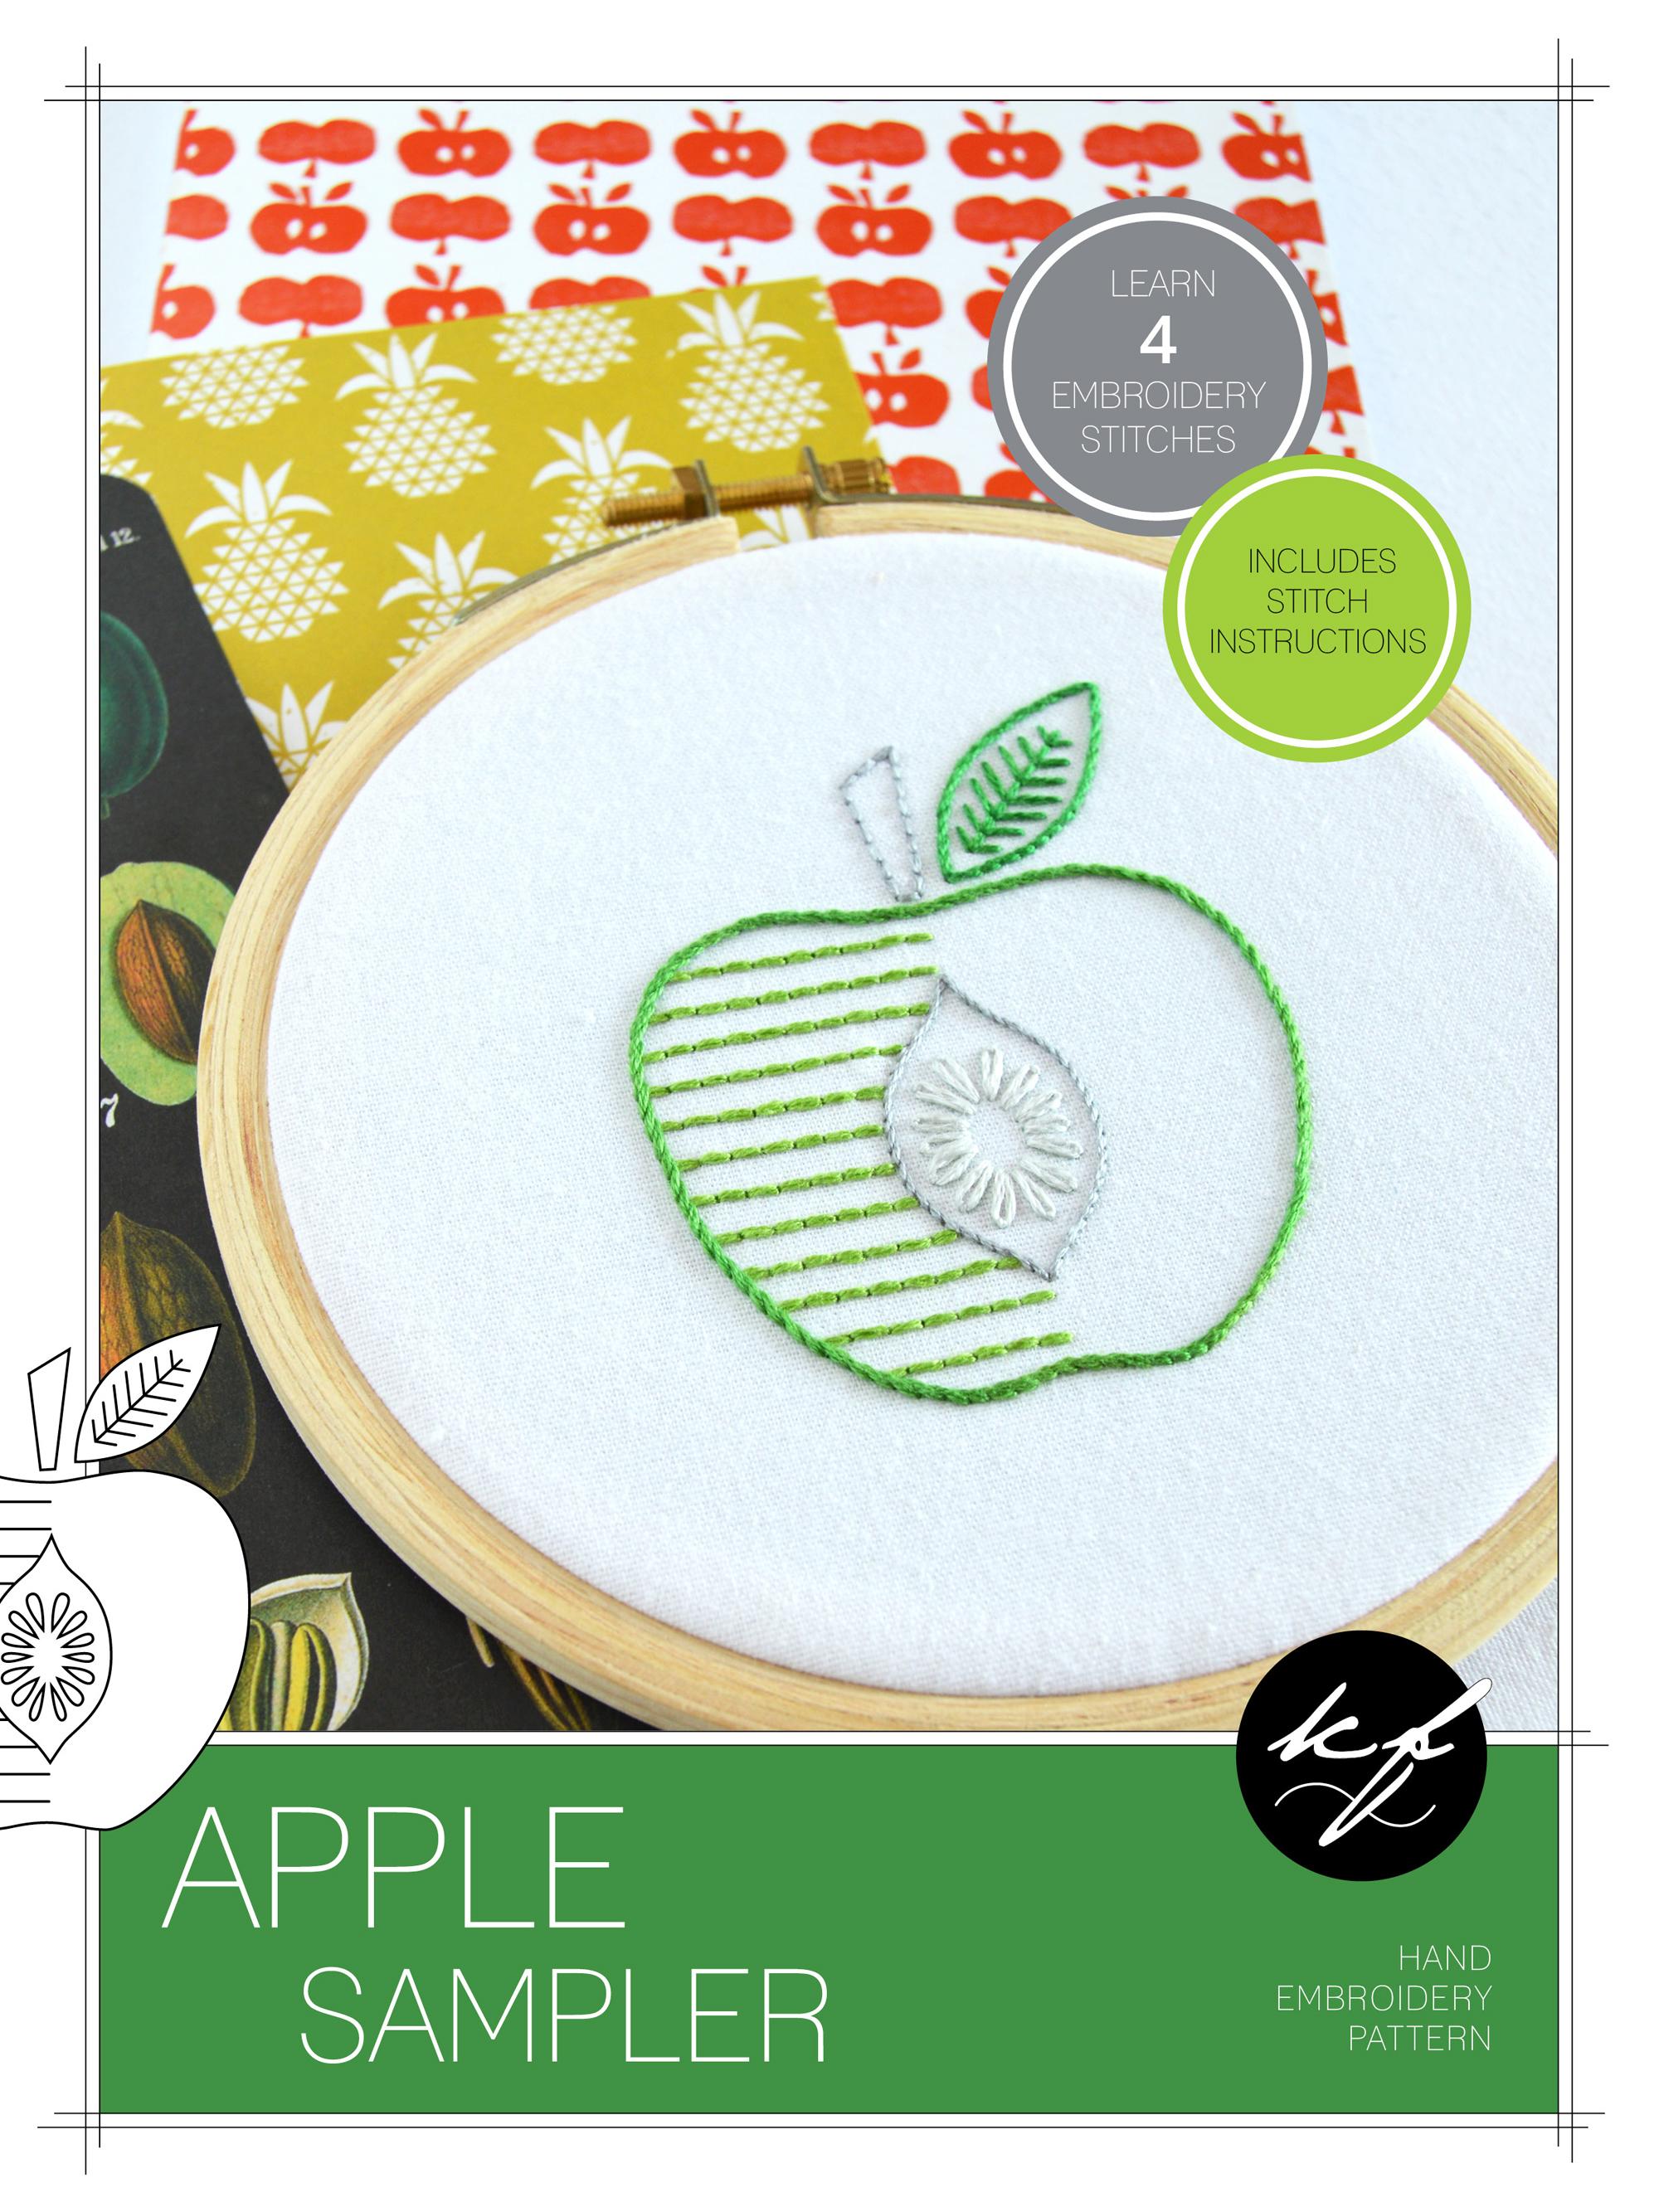 AppleSamplerEmbroideryPattern_KellyFletcher.jpg